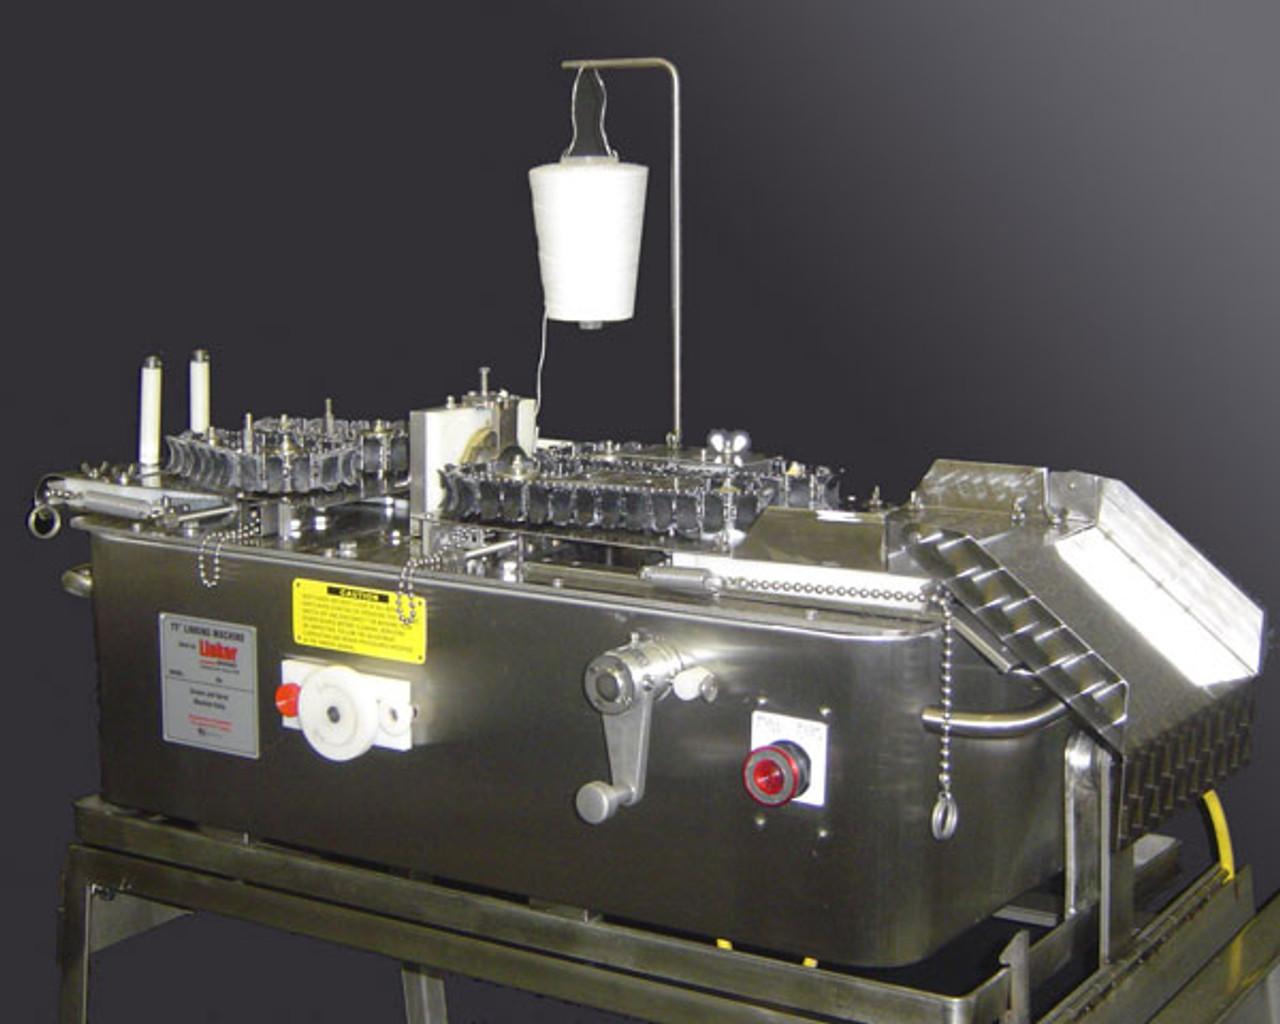 ST005 Linker Machine